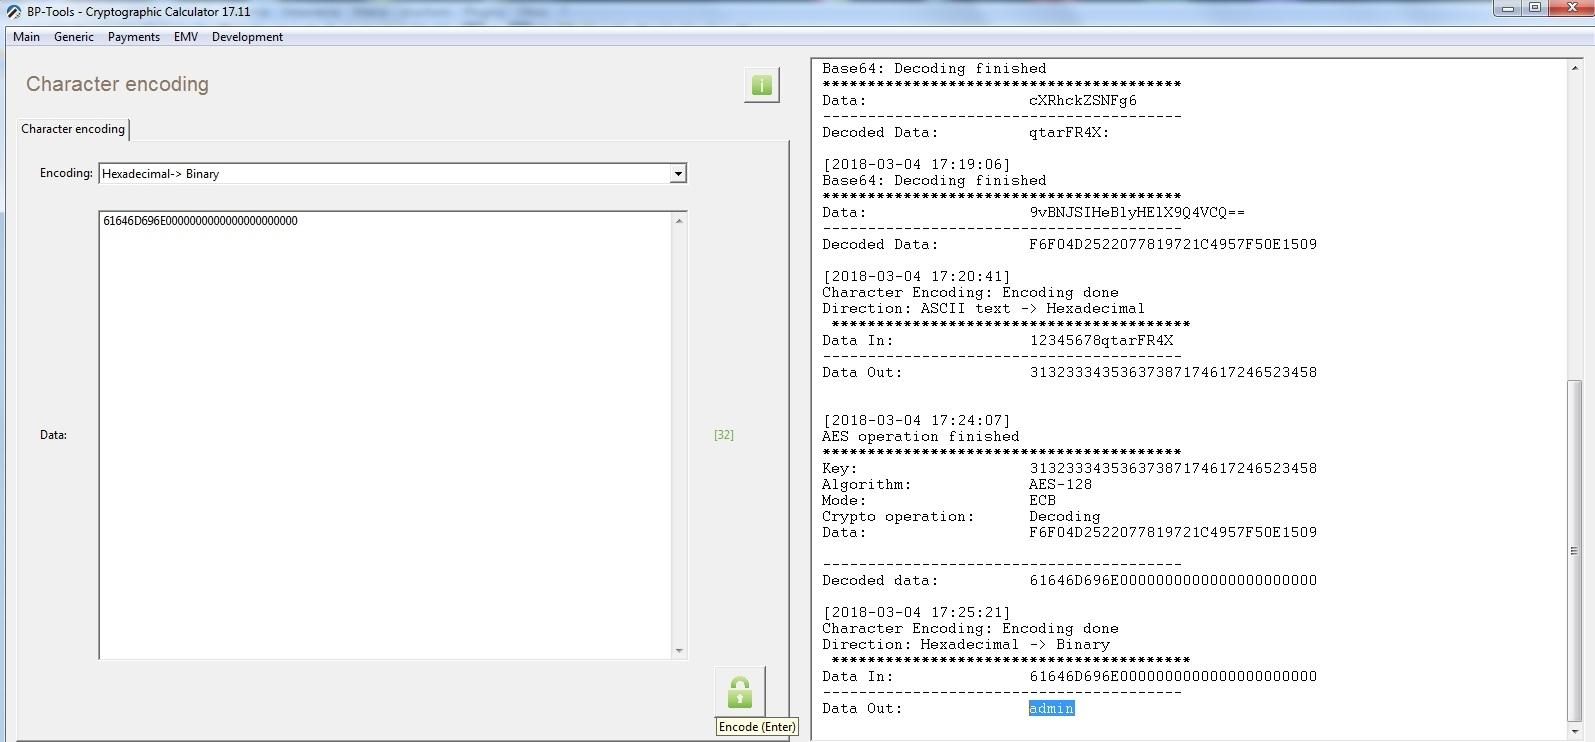 Huawei B593s-22 - Access to b593s-22 - Putty SSH